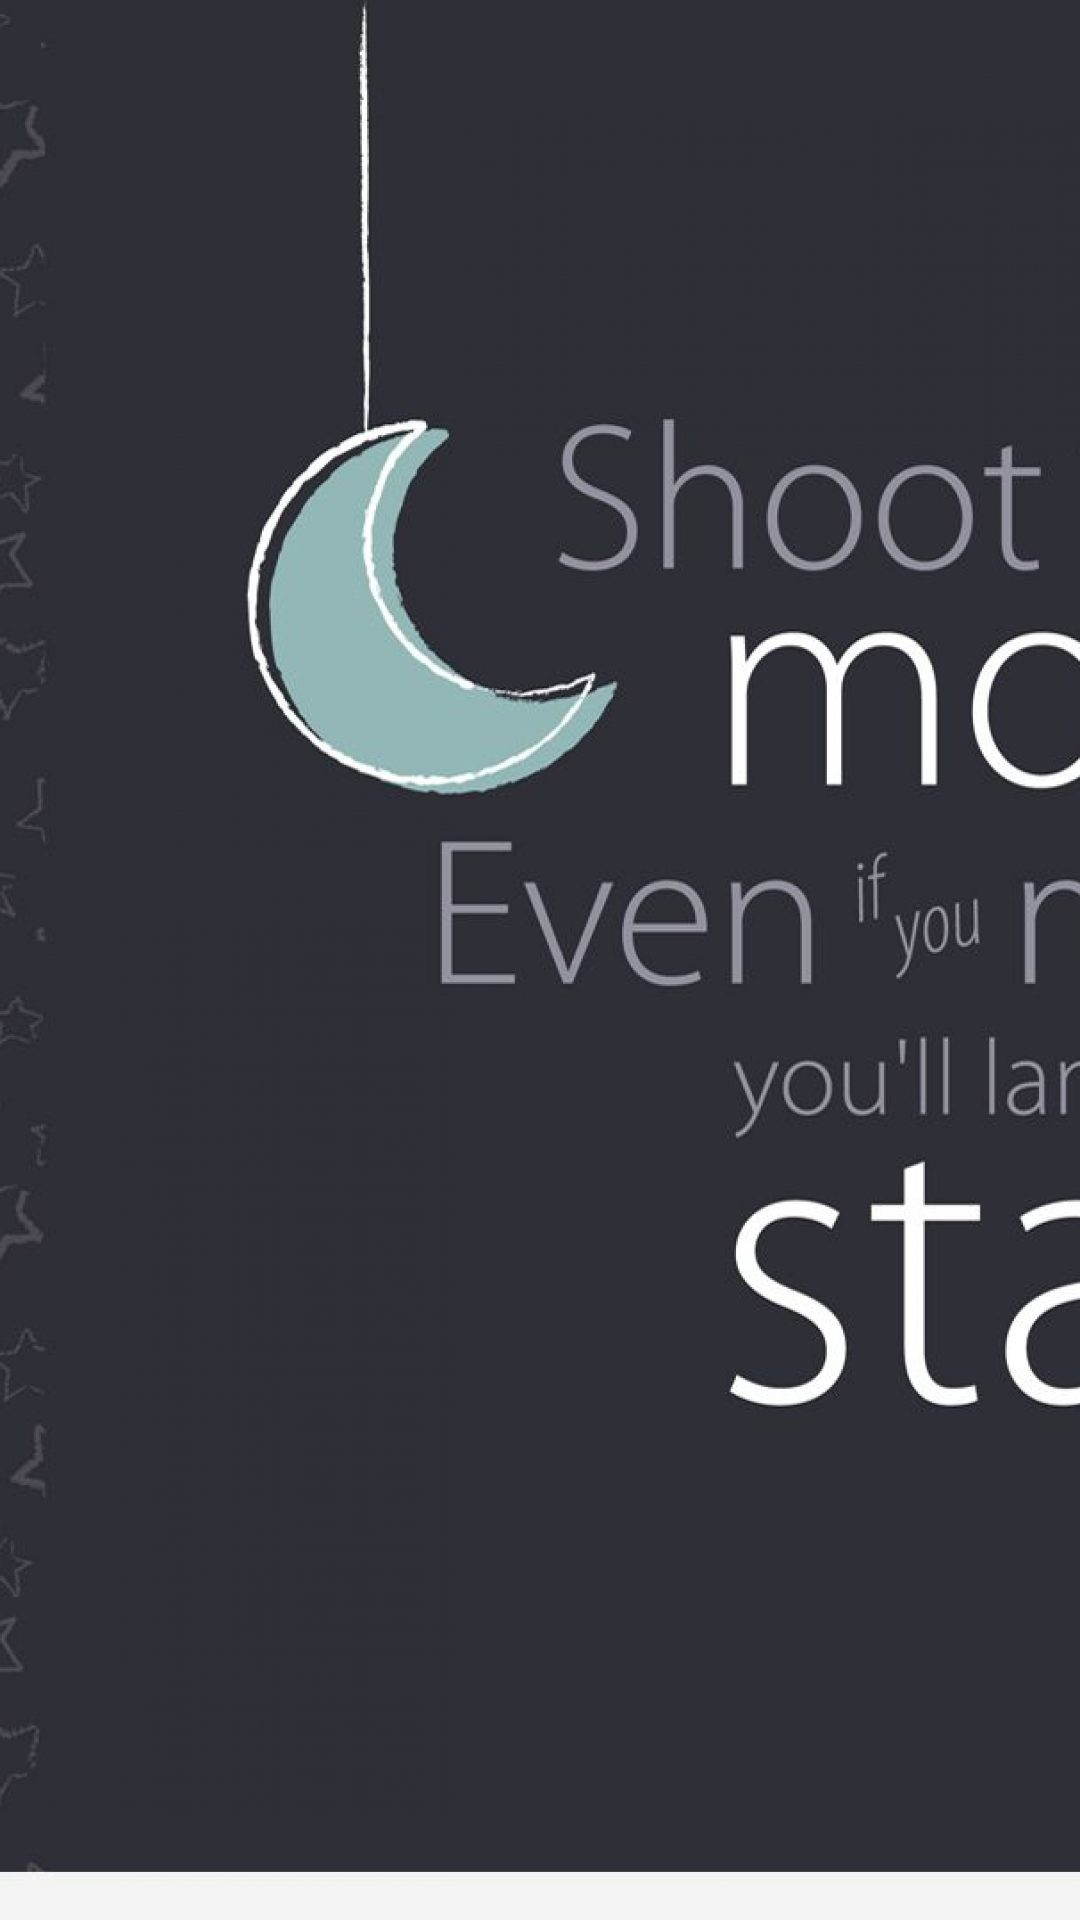 Tumblr Inspirational Quotes Wallpaper   Data-src - Inspirational Quotes Wallpaper Iphone - HD Wallpaper